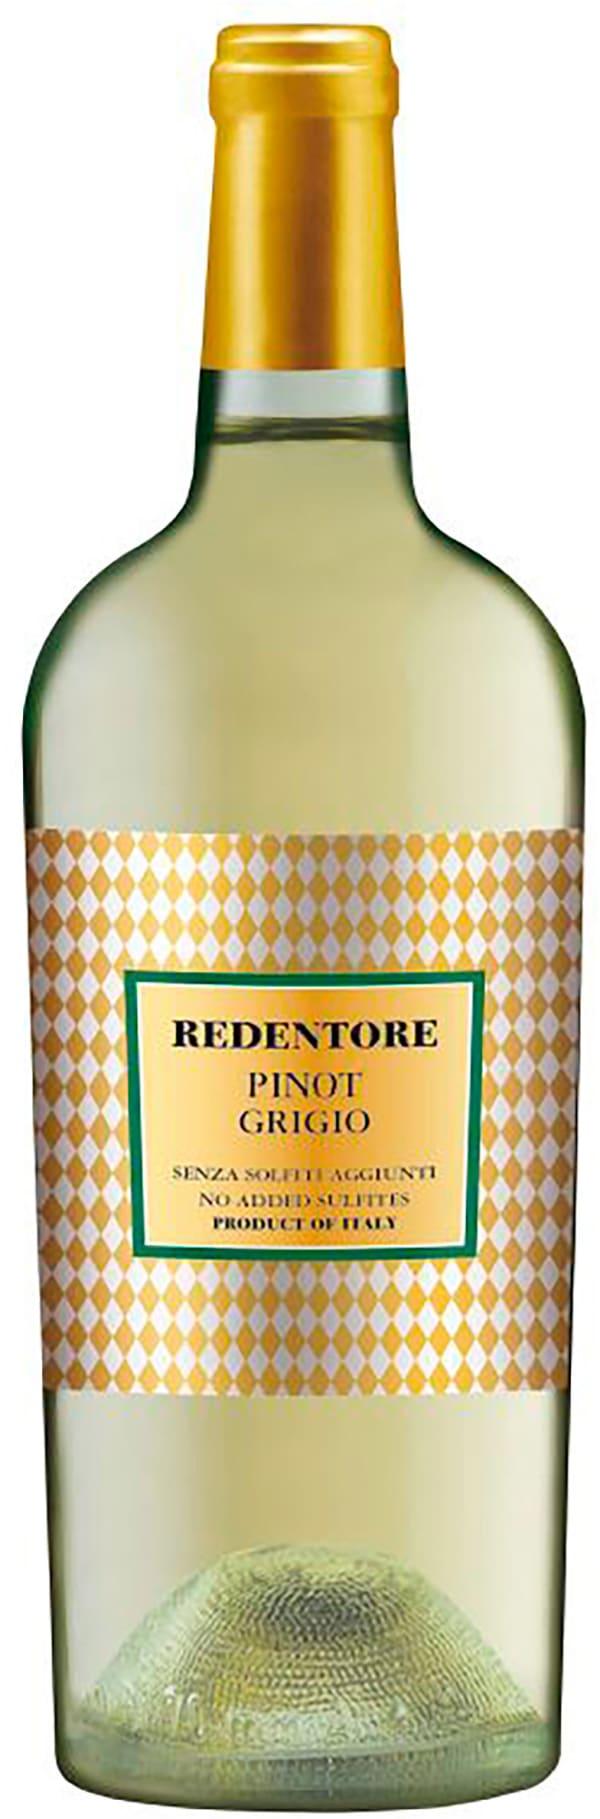 Redentore Pinot Grigio 2017